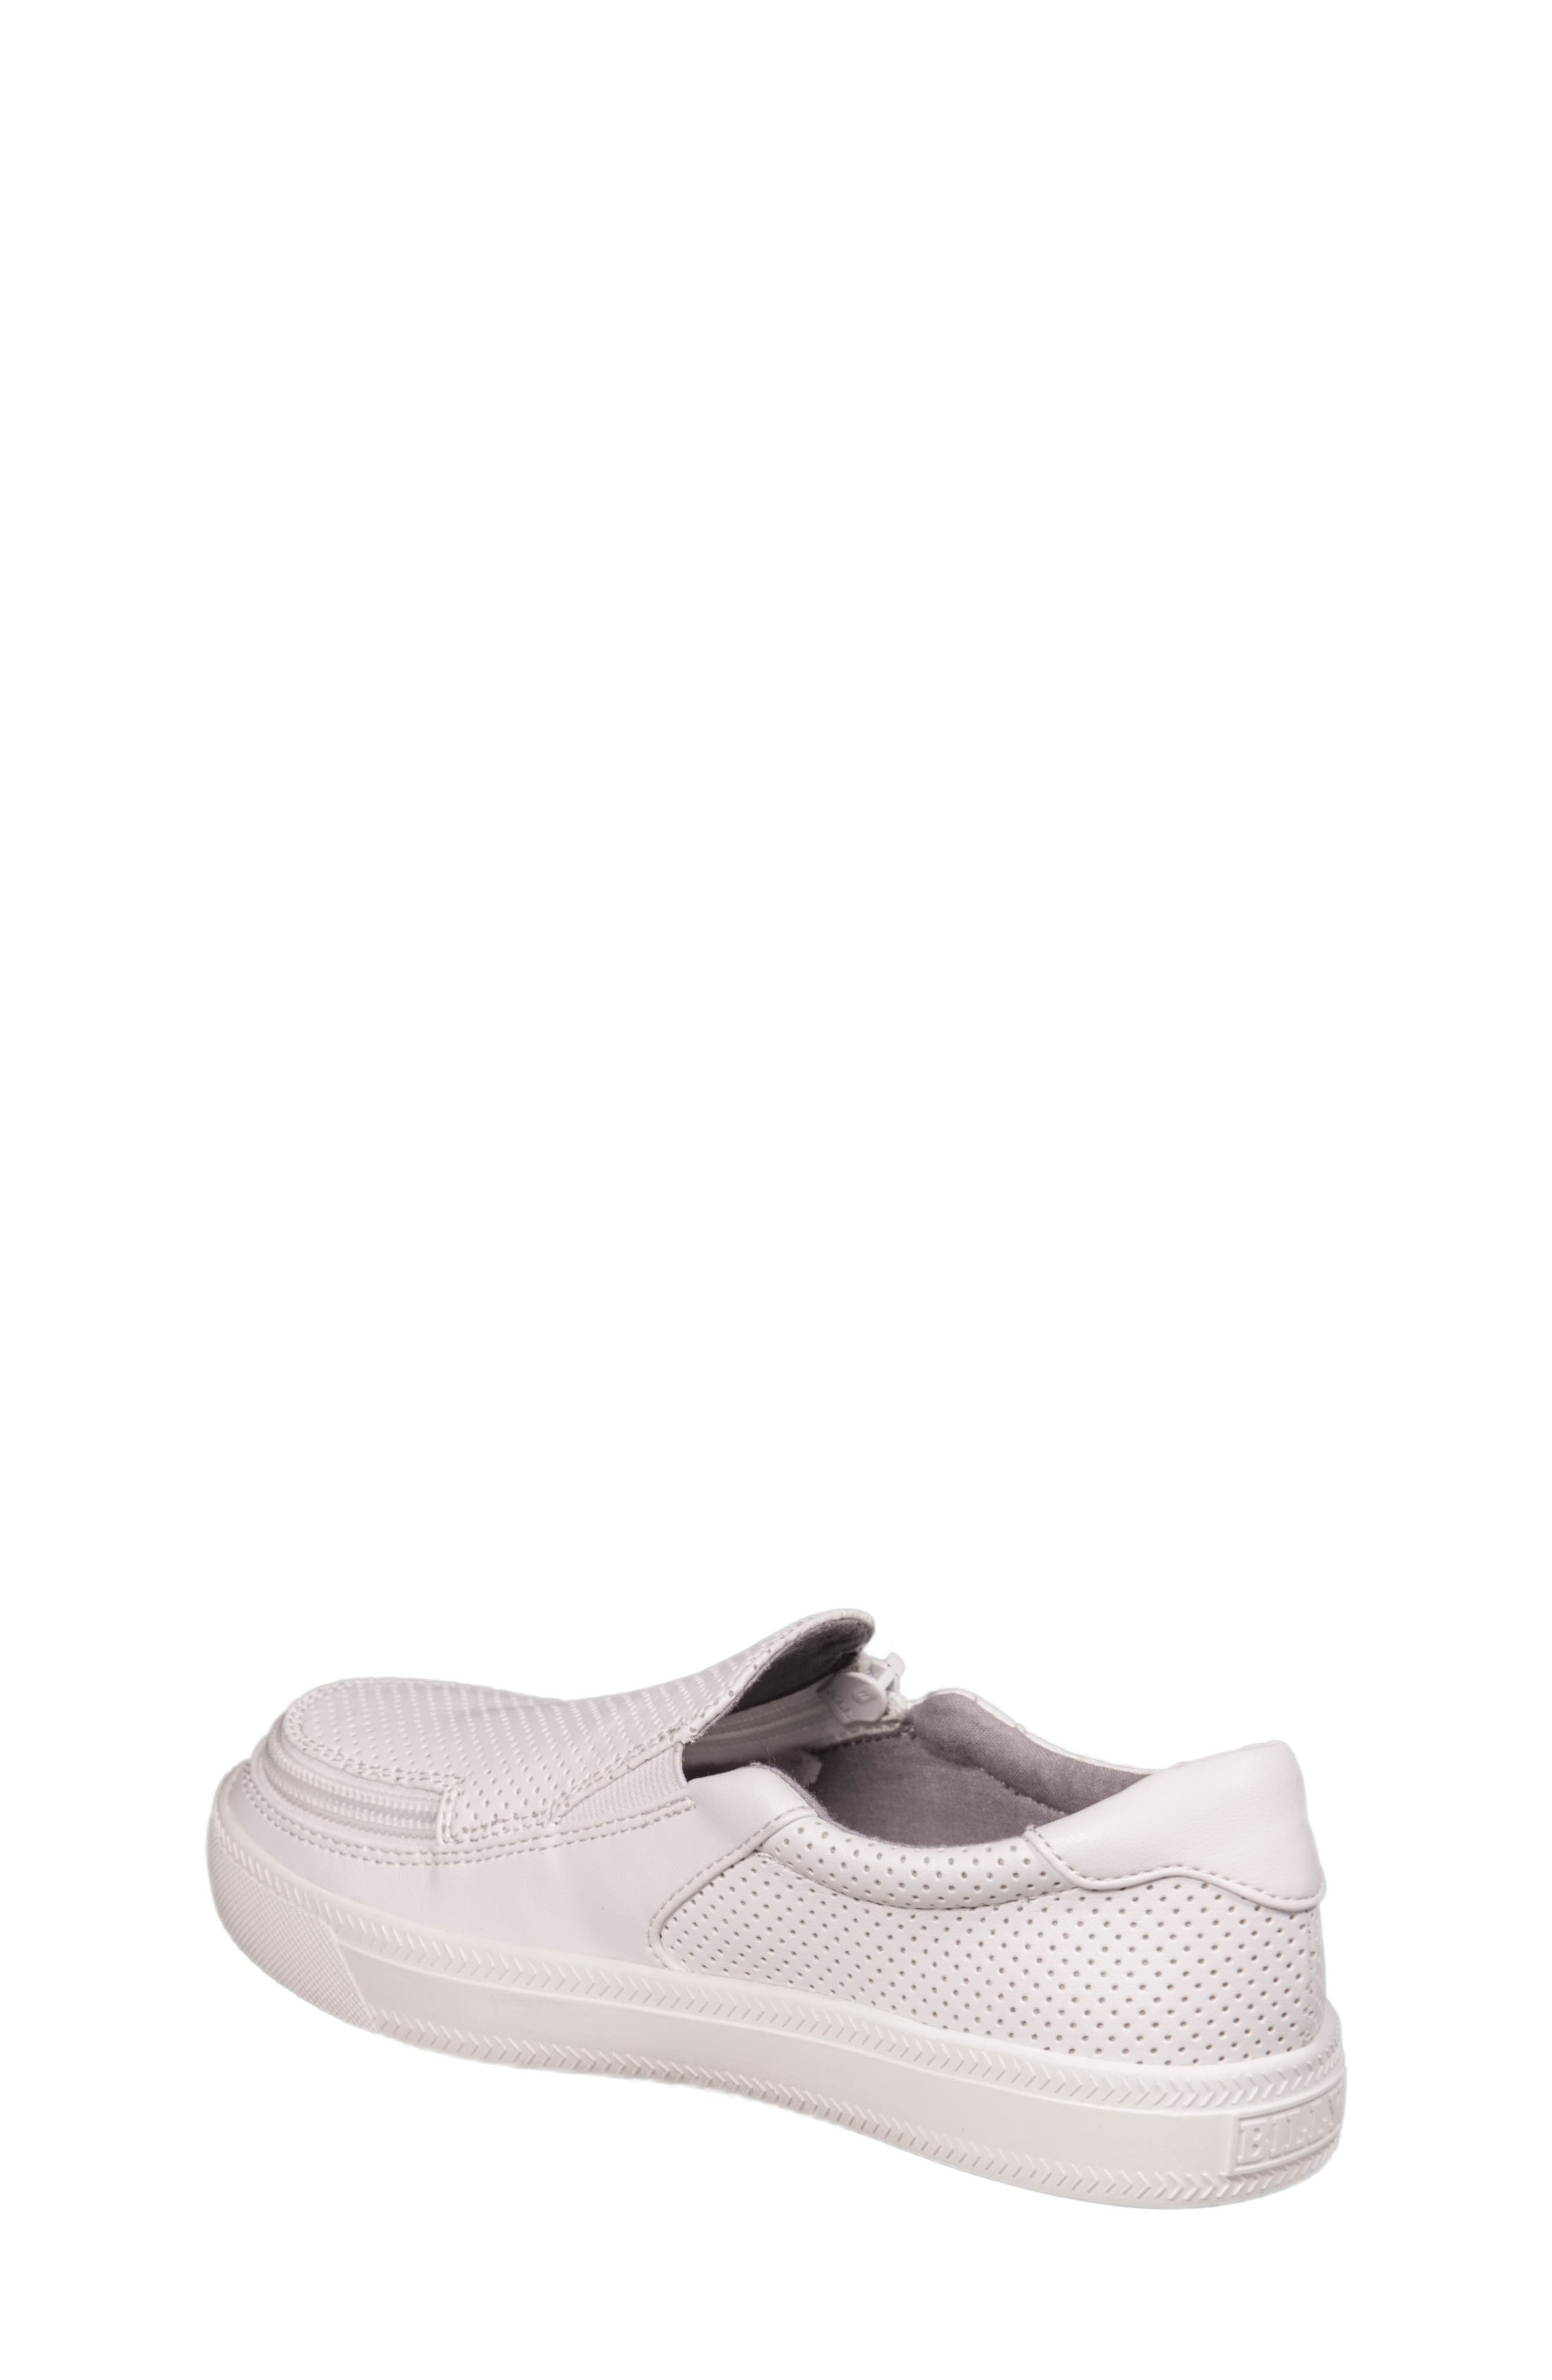 Zip Around Perforated Low Top Sneaker,                             Alternate thumbnail 4, color,